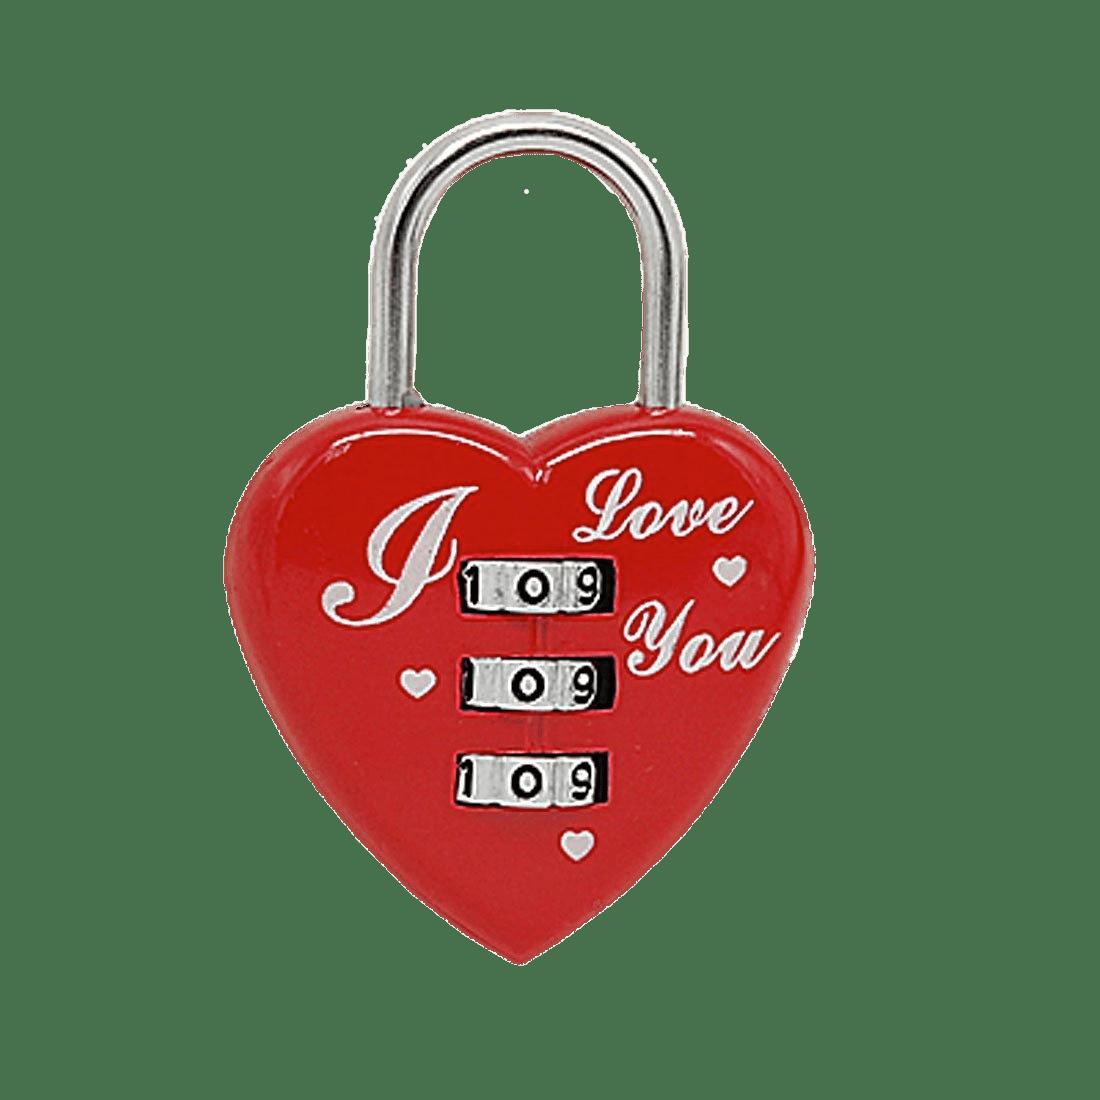 Lock clipart lock chain. Heart shaped combination transparent